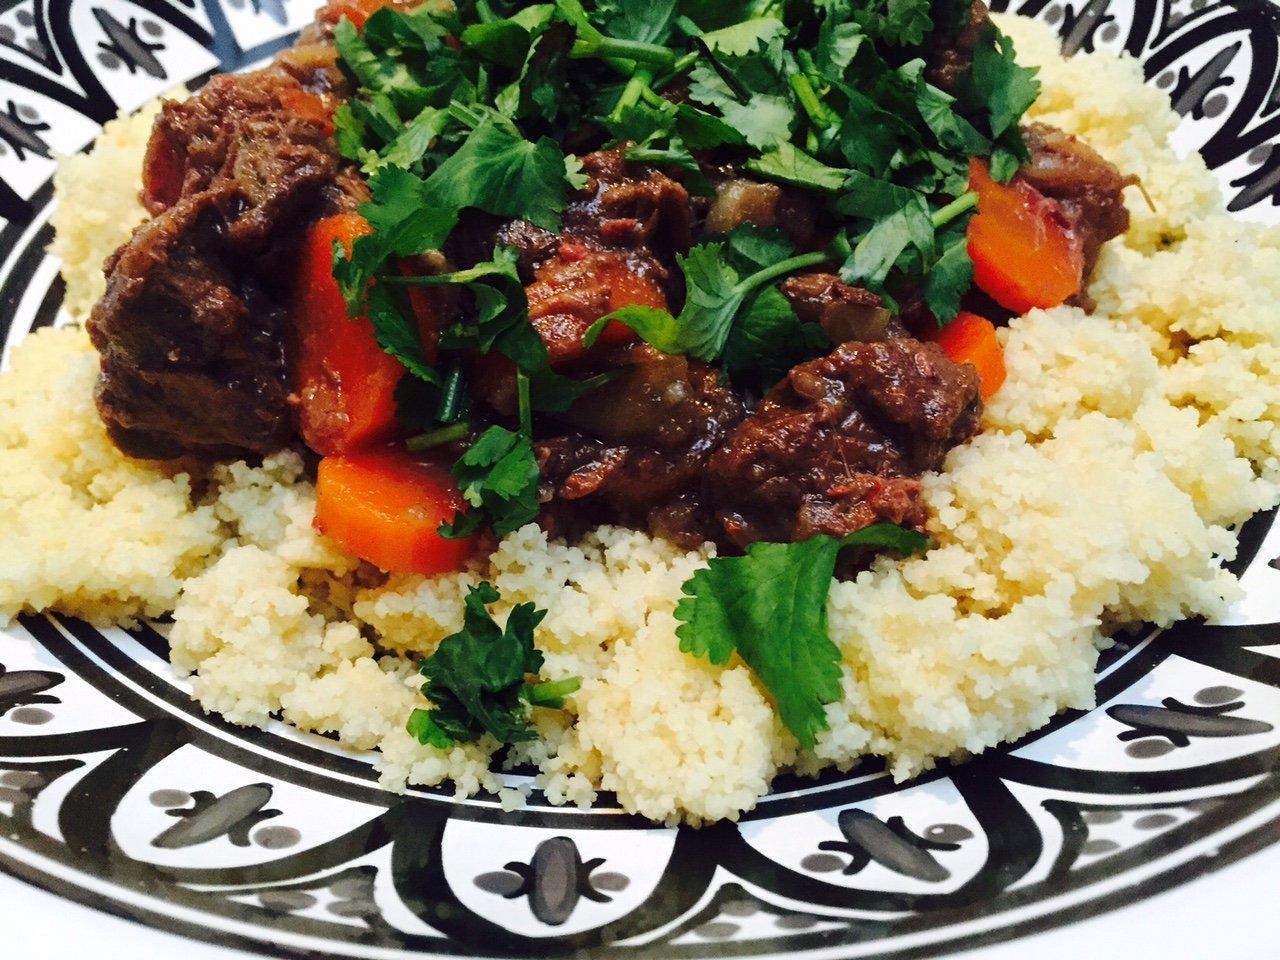 Marokkaanse zoete stoofschotel recept foodblog Foodinista